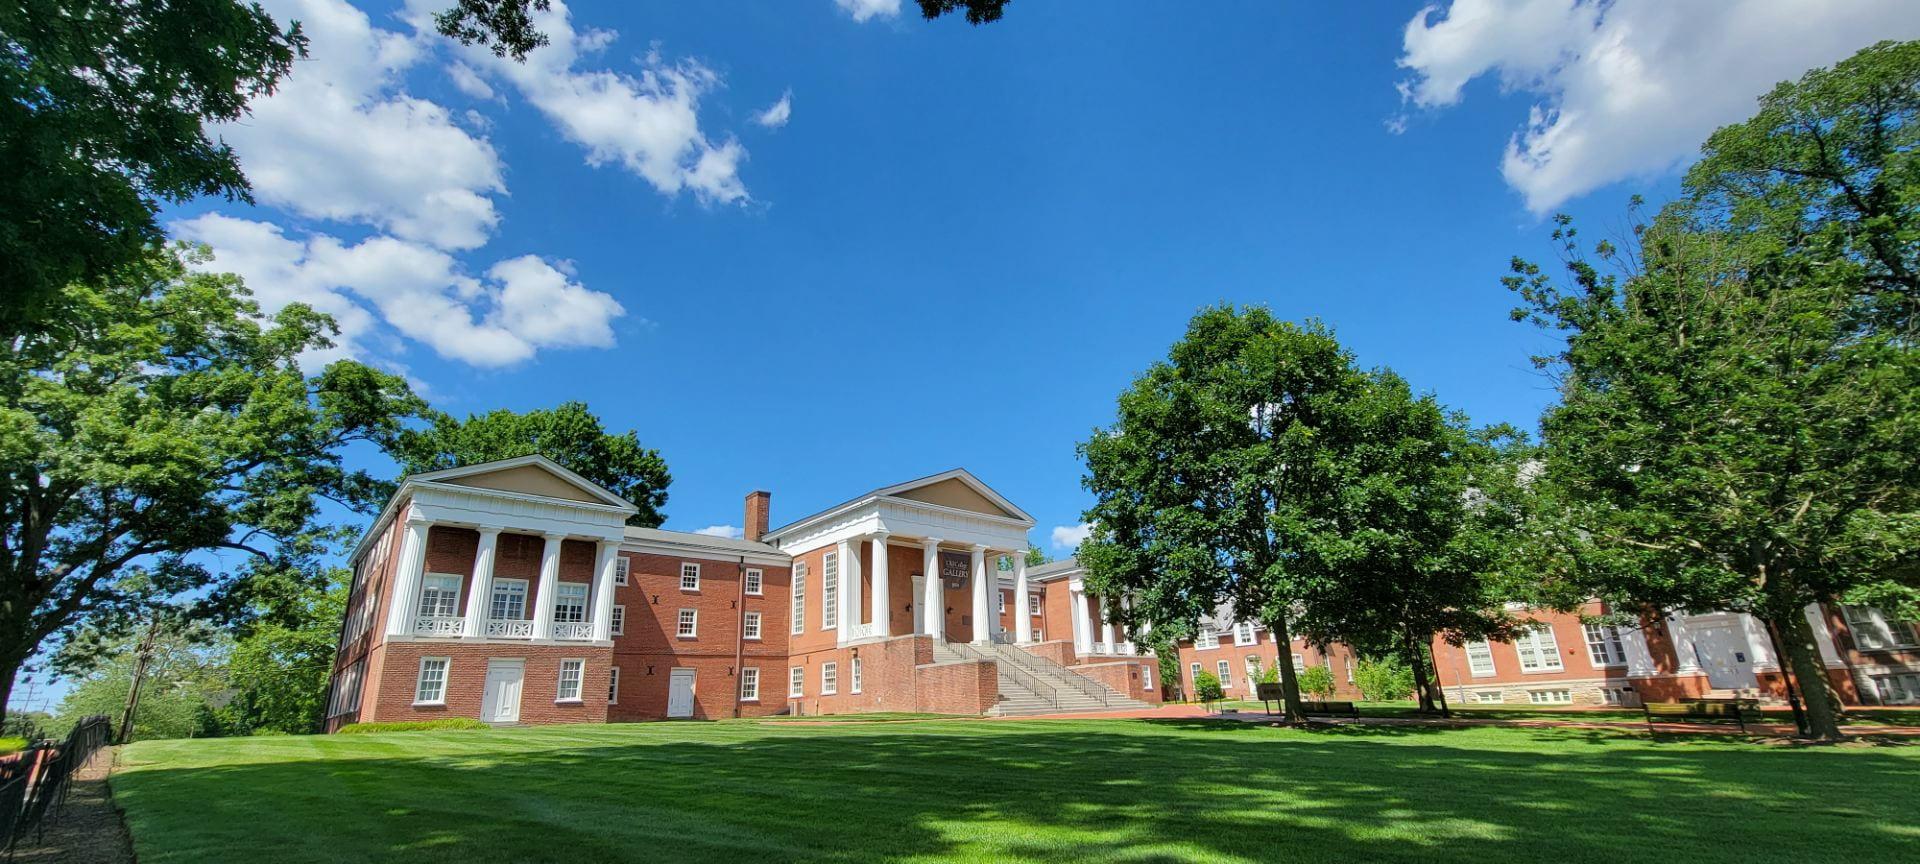 Old College, University of Delaware